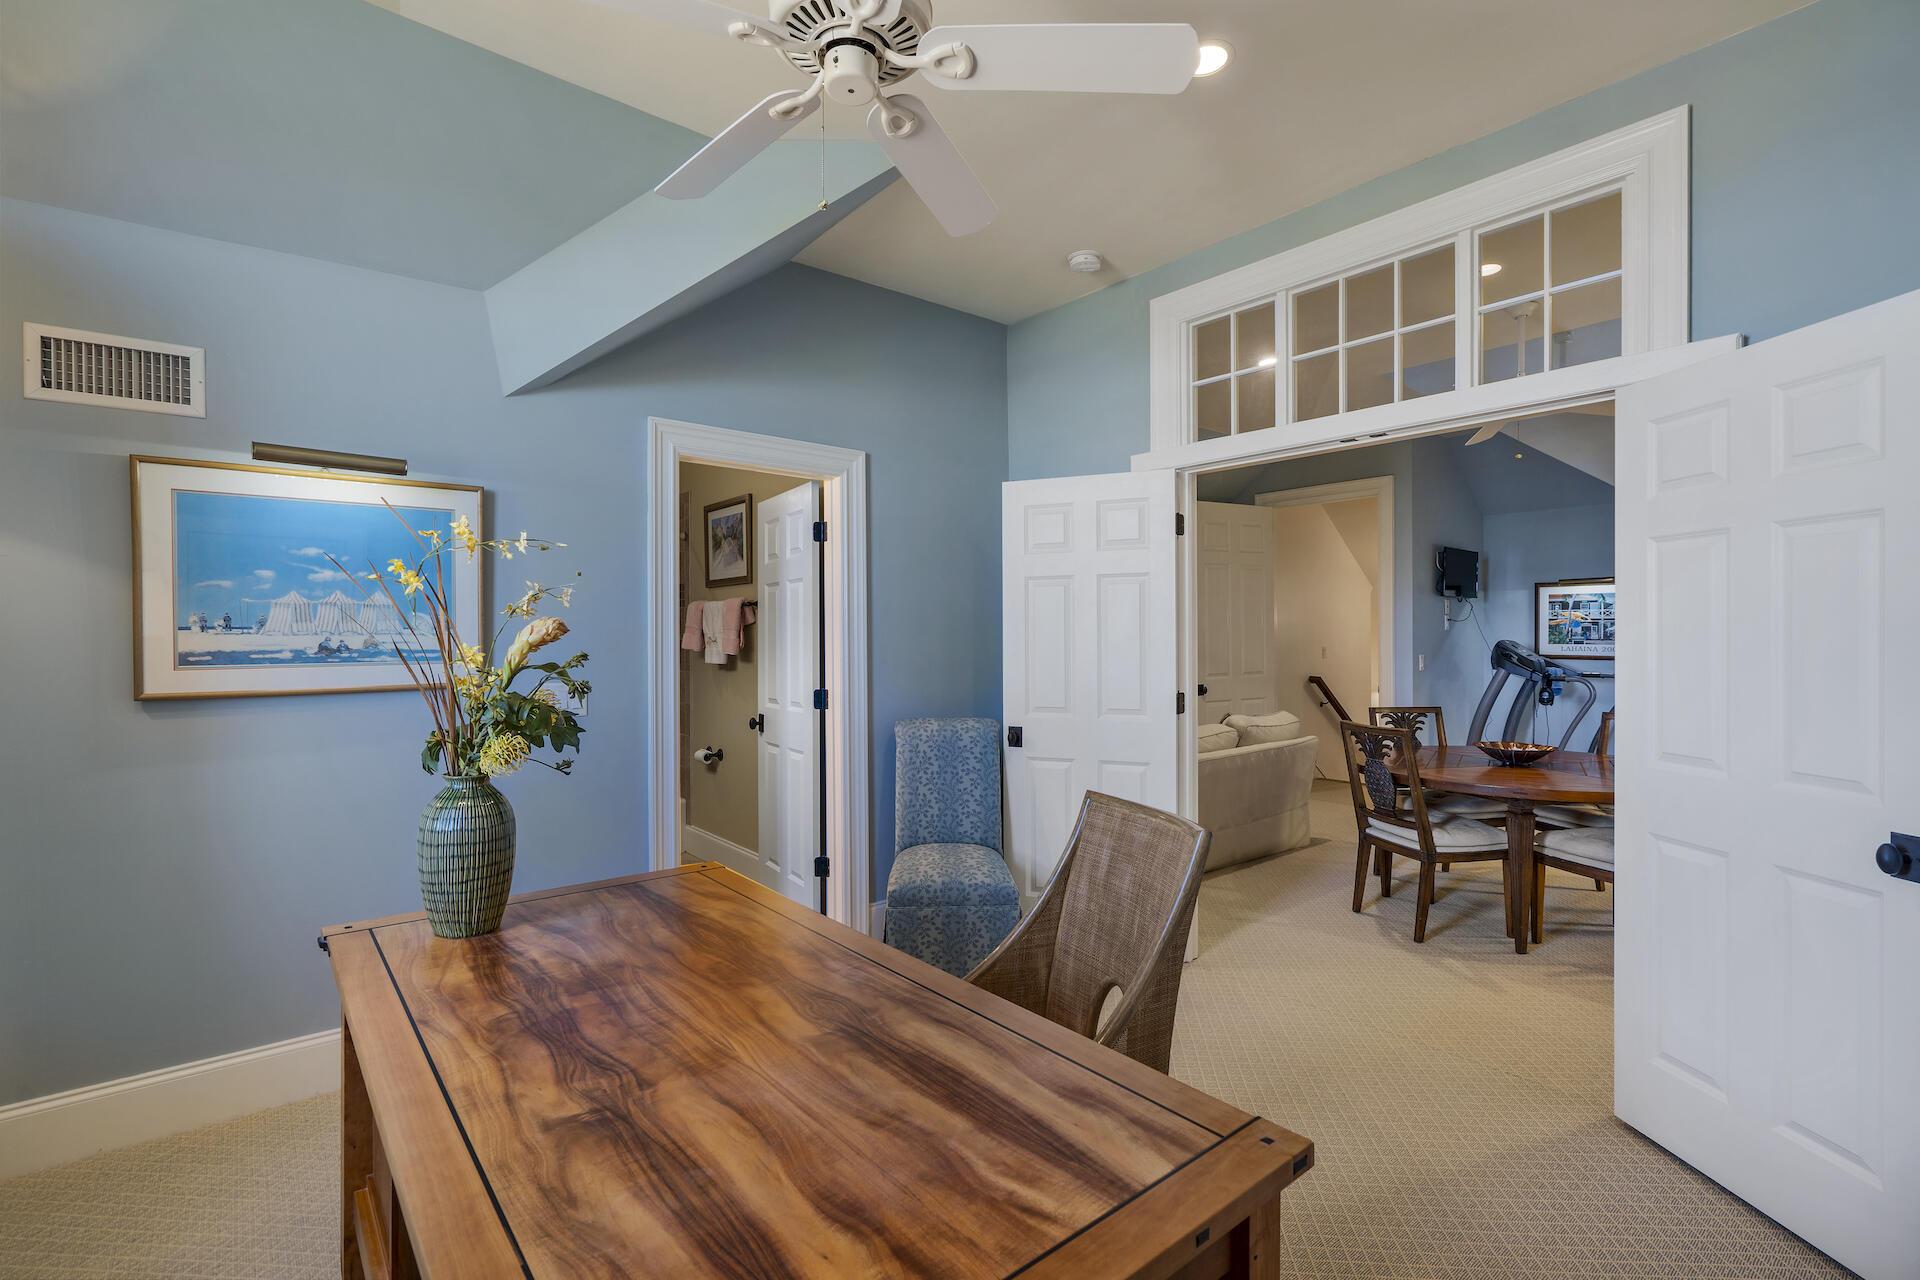 Daniel Island Homes For Sale - 623 Island Park, Charleston, SC - 7